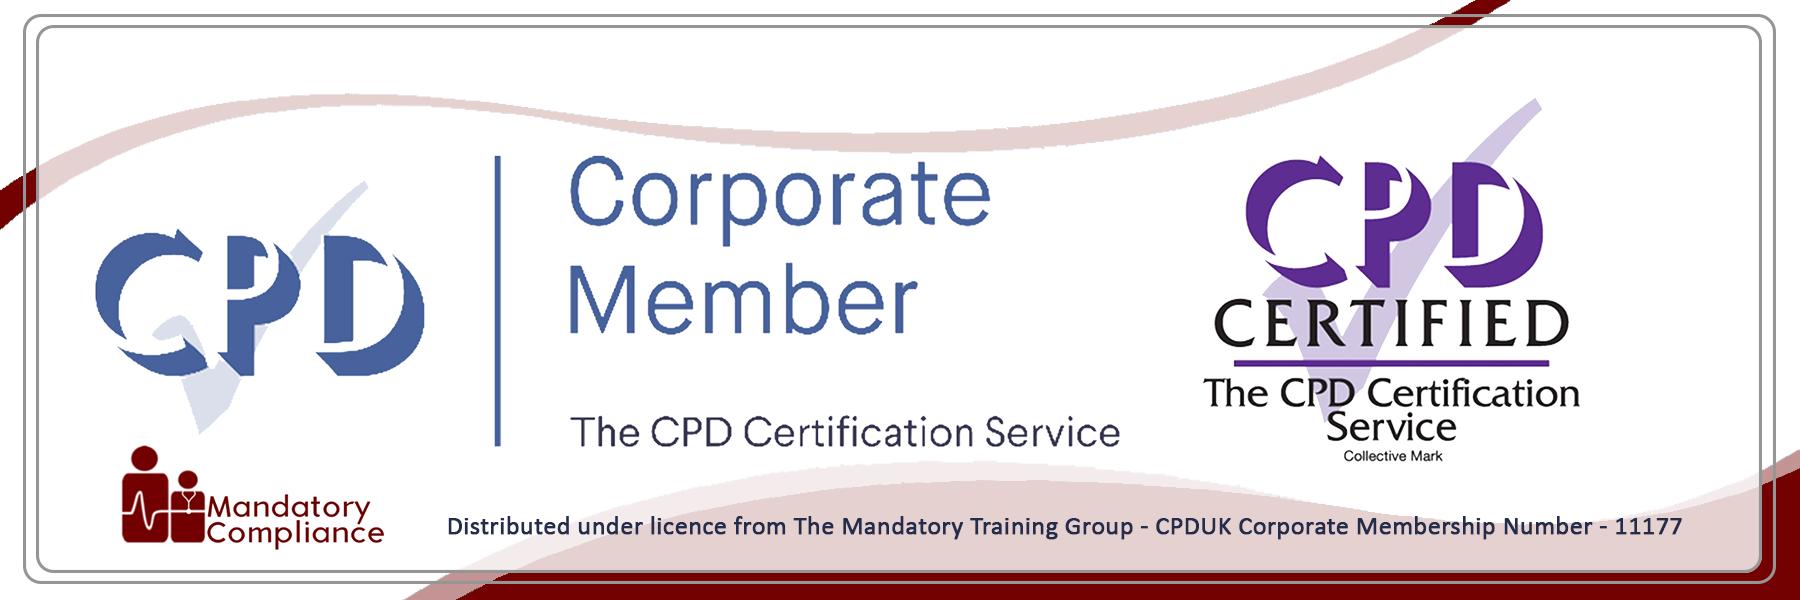 Coronavirus Awareness - Online Training Course - Mandatory Compliance UK -